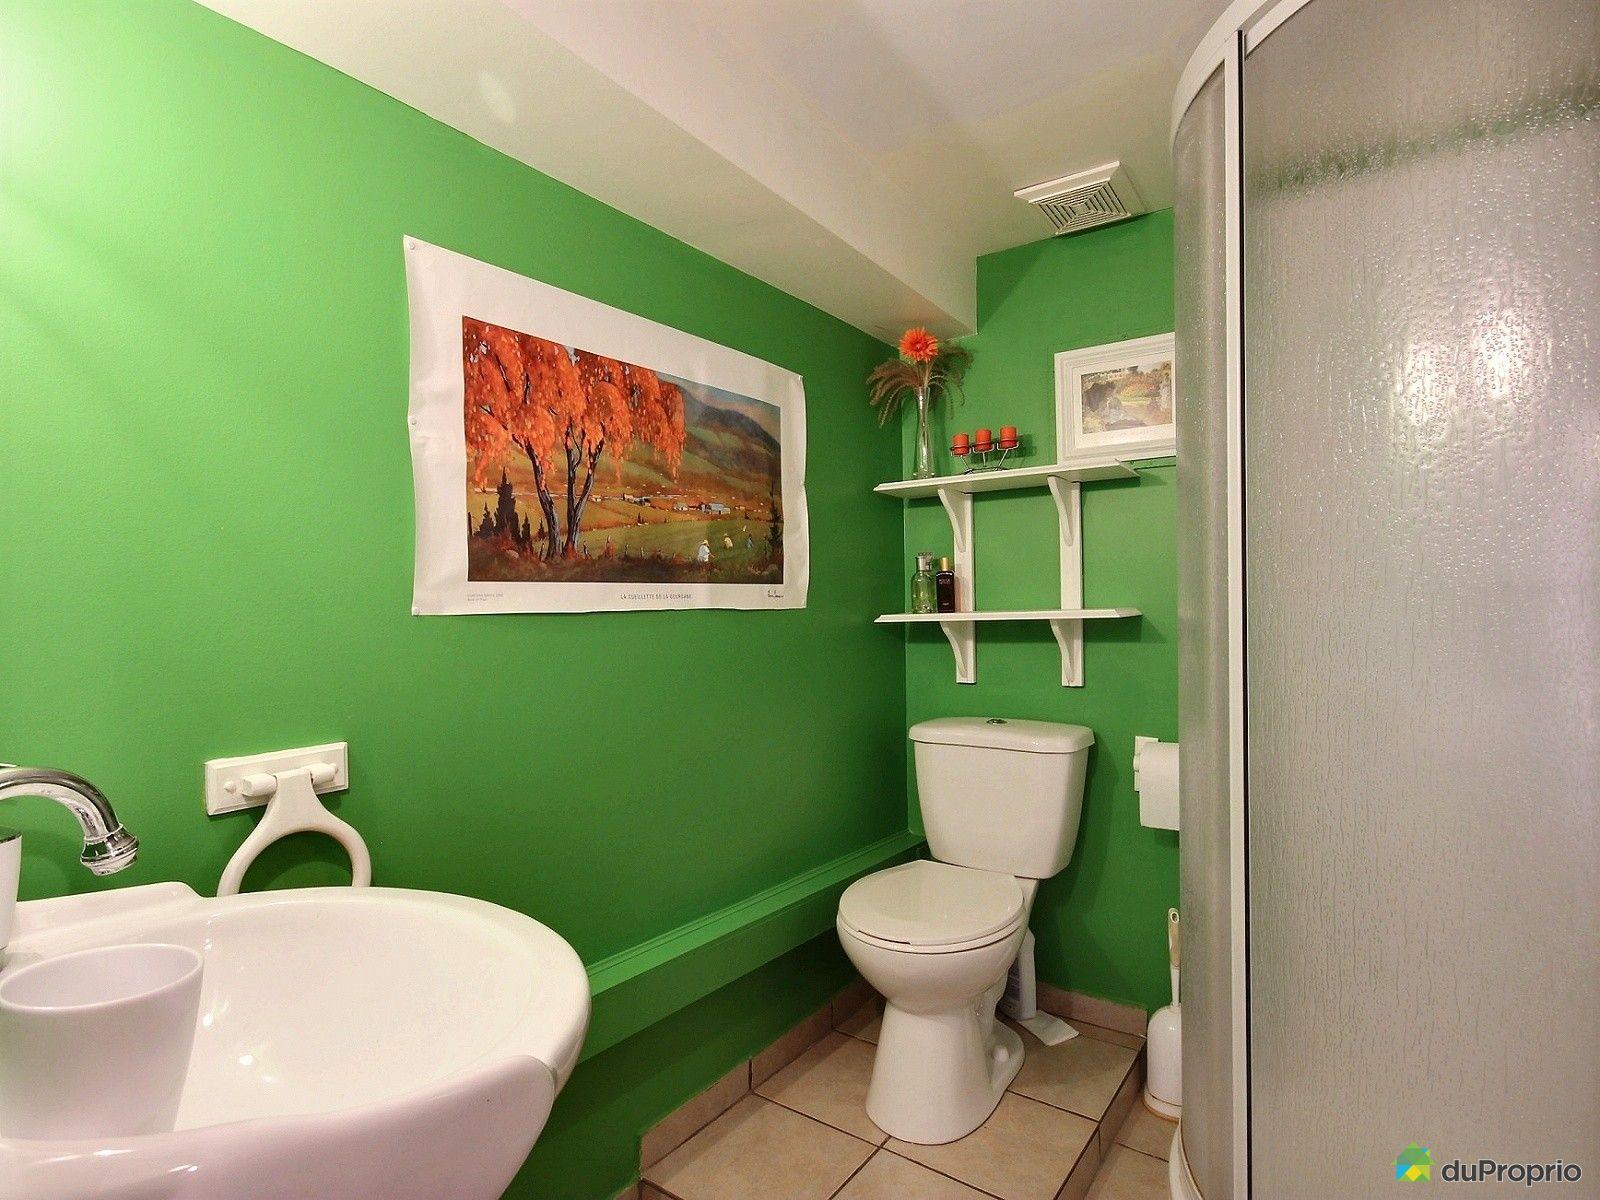 maison vendre ile d 39 orl ans st fran ois 3855 chemin royal immobilier qu bec duproprio 630553. Black Bedroom Furniture Sets. Home Design Ideas